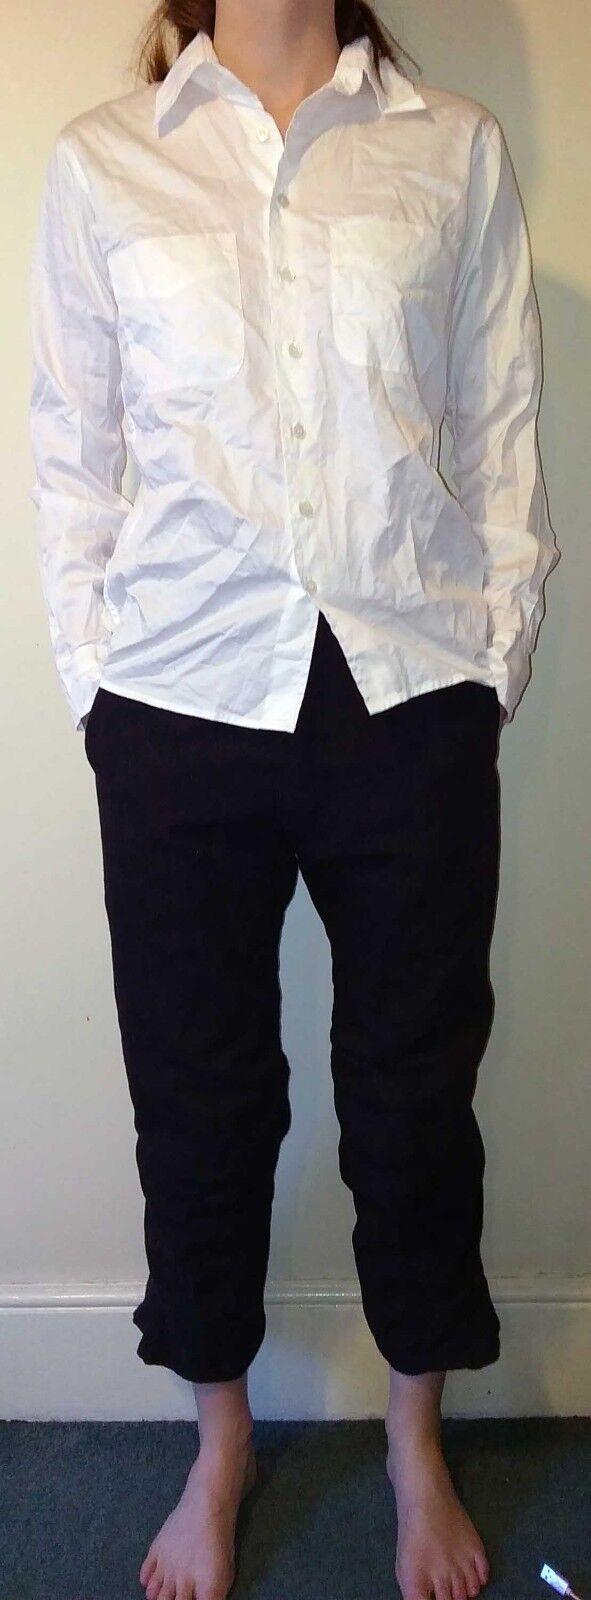 PAUL HARNDEN SHOEMAKERS Womens Cotton Brace Jeans (Size S)